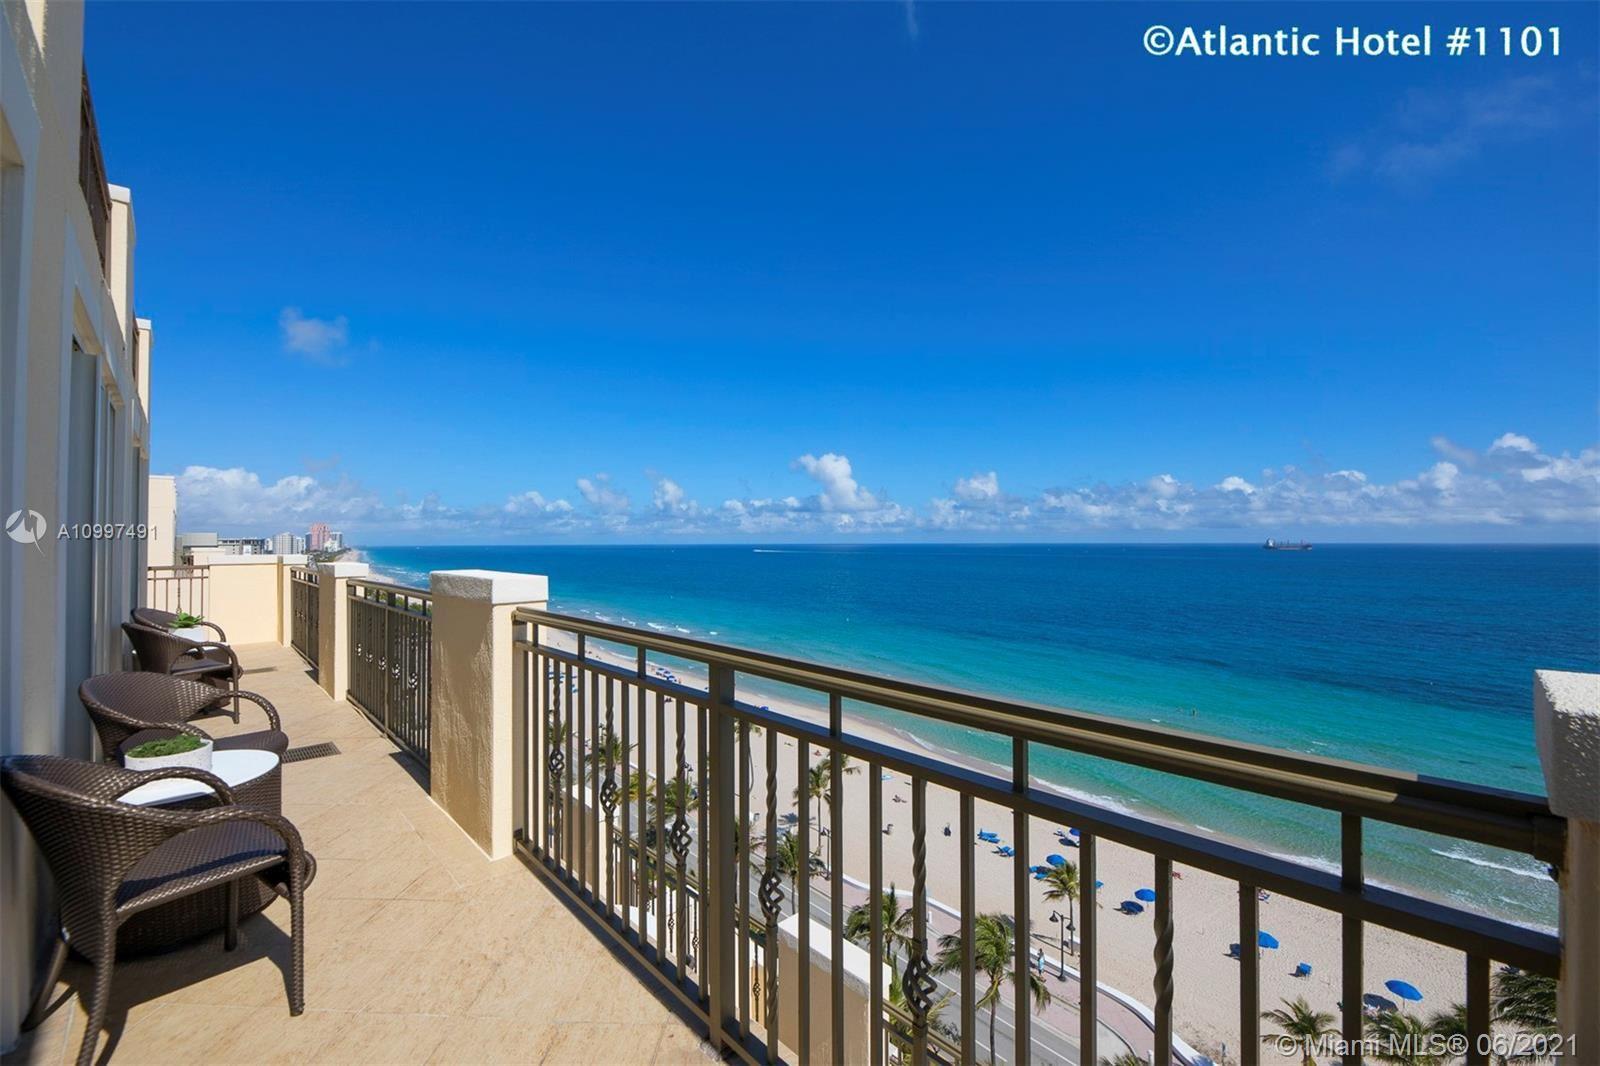 601 N Fort Lauderdale Beach Blvd #1101, Fort Lauderdale, FL 33304 - #: A10997491